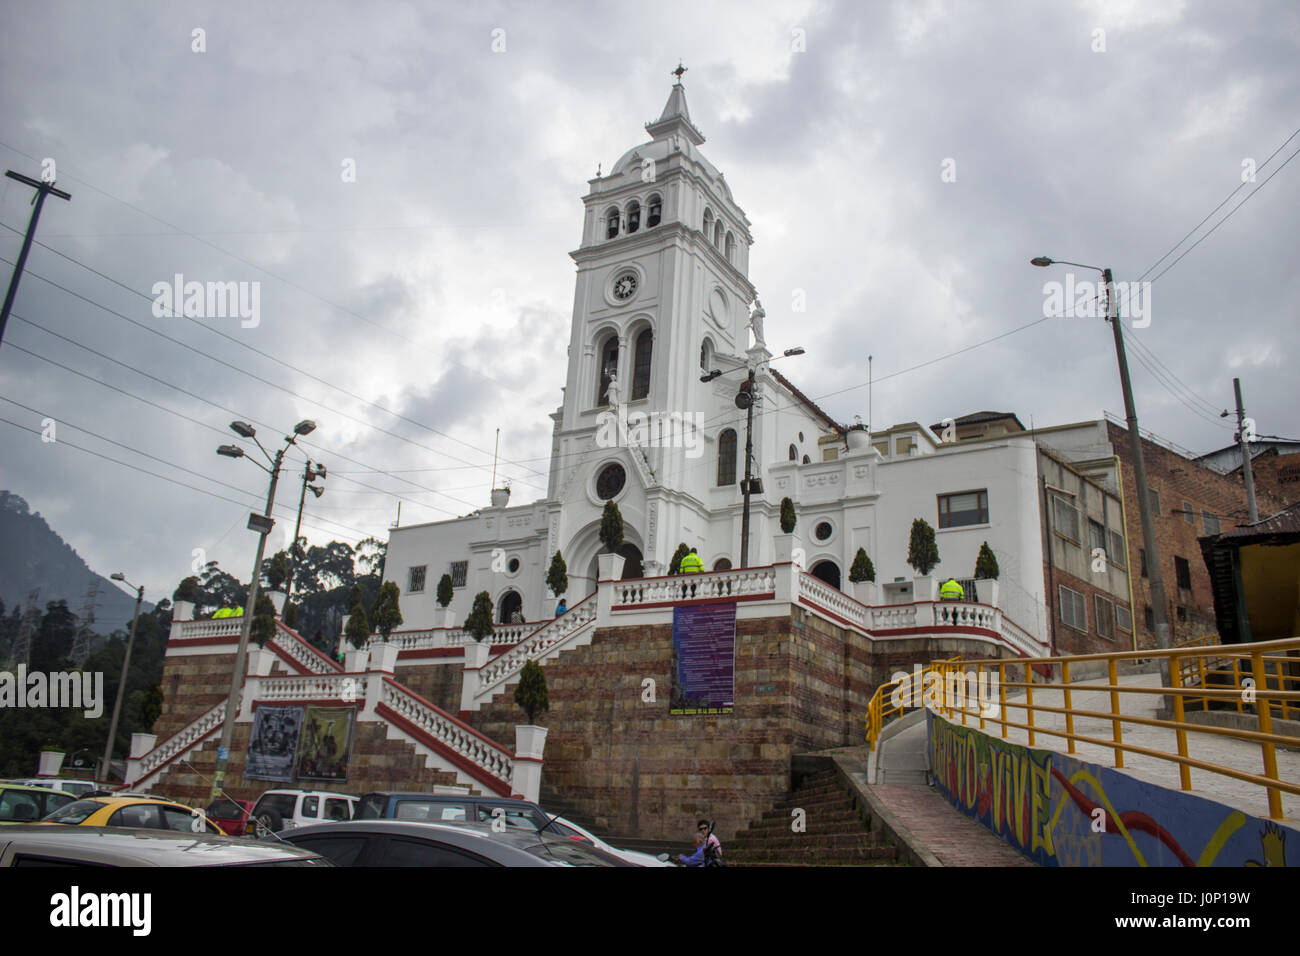 Church of Our Lady of Egypt, Barrio Egipto - Stock Image